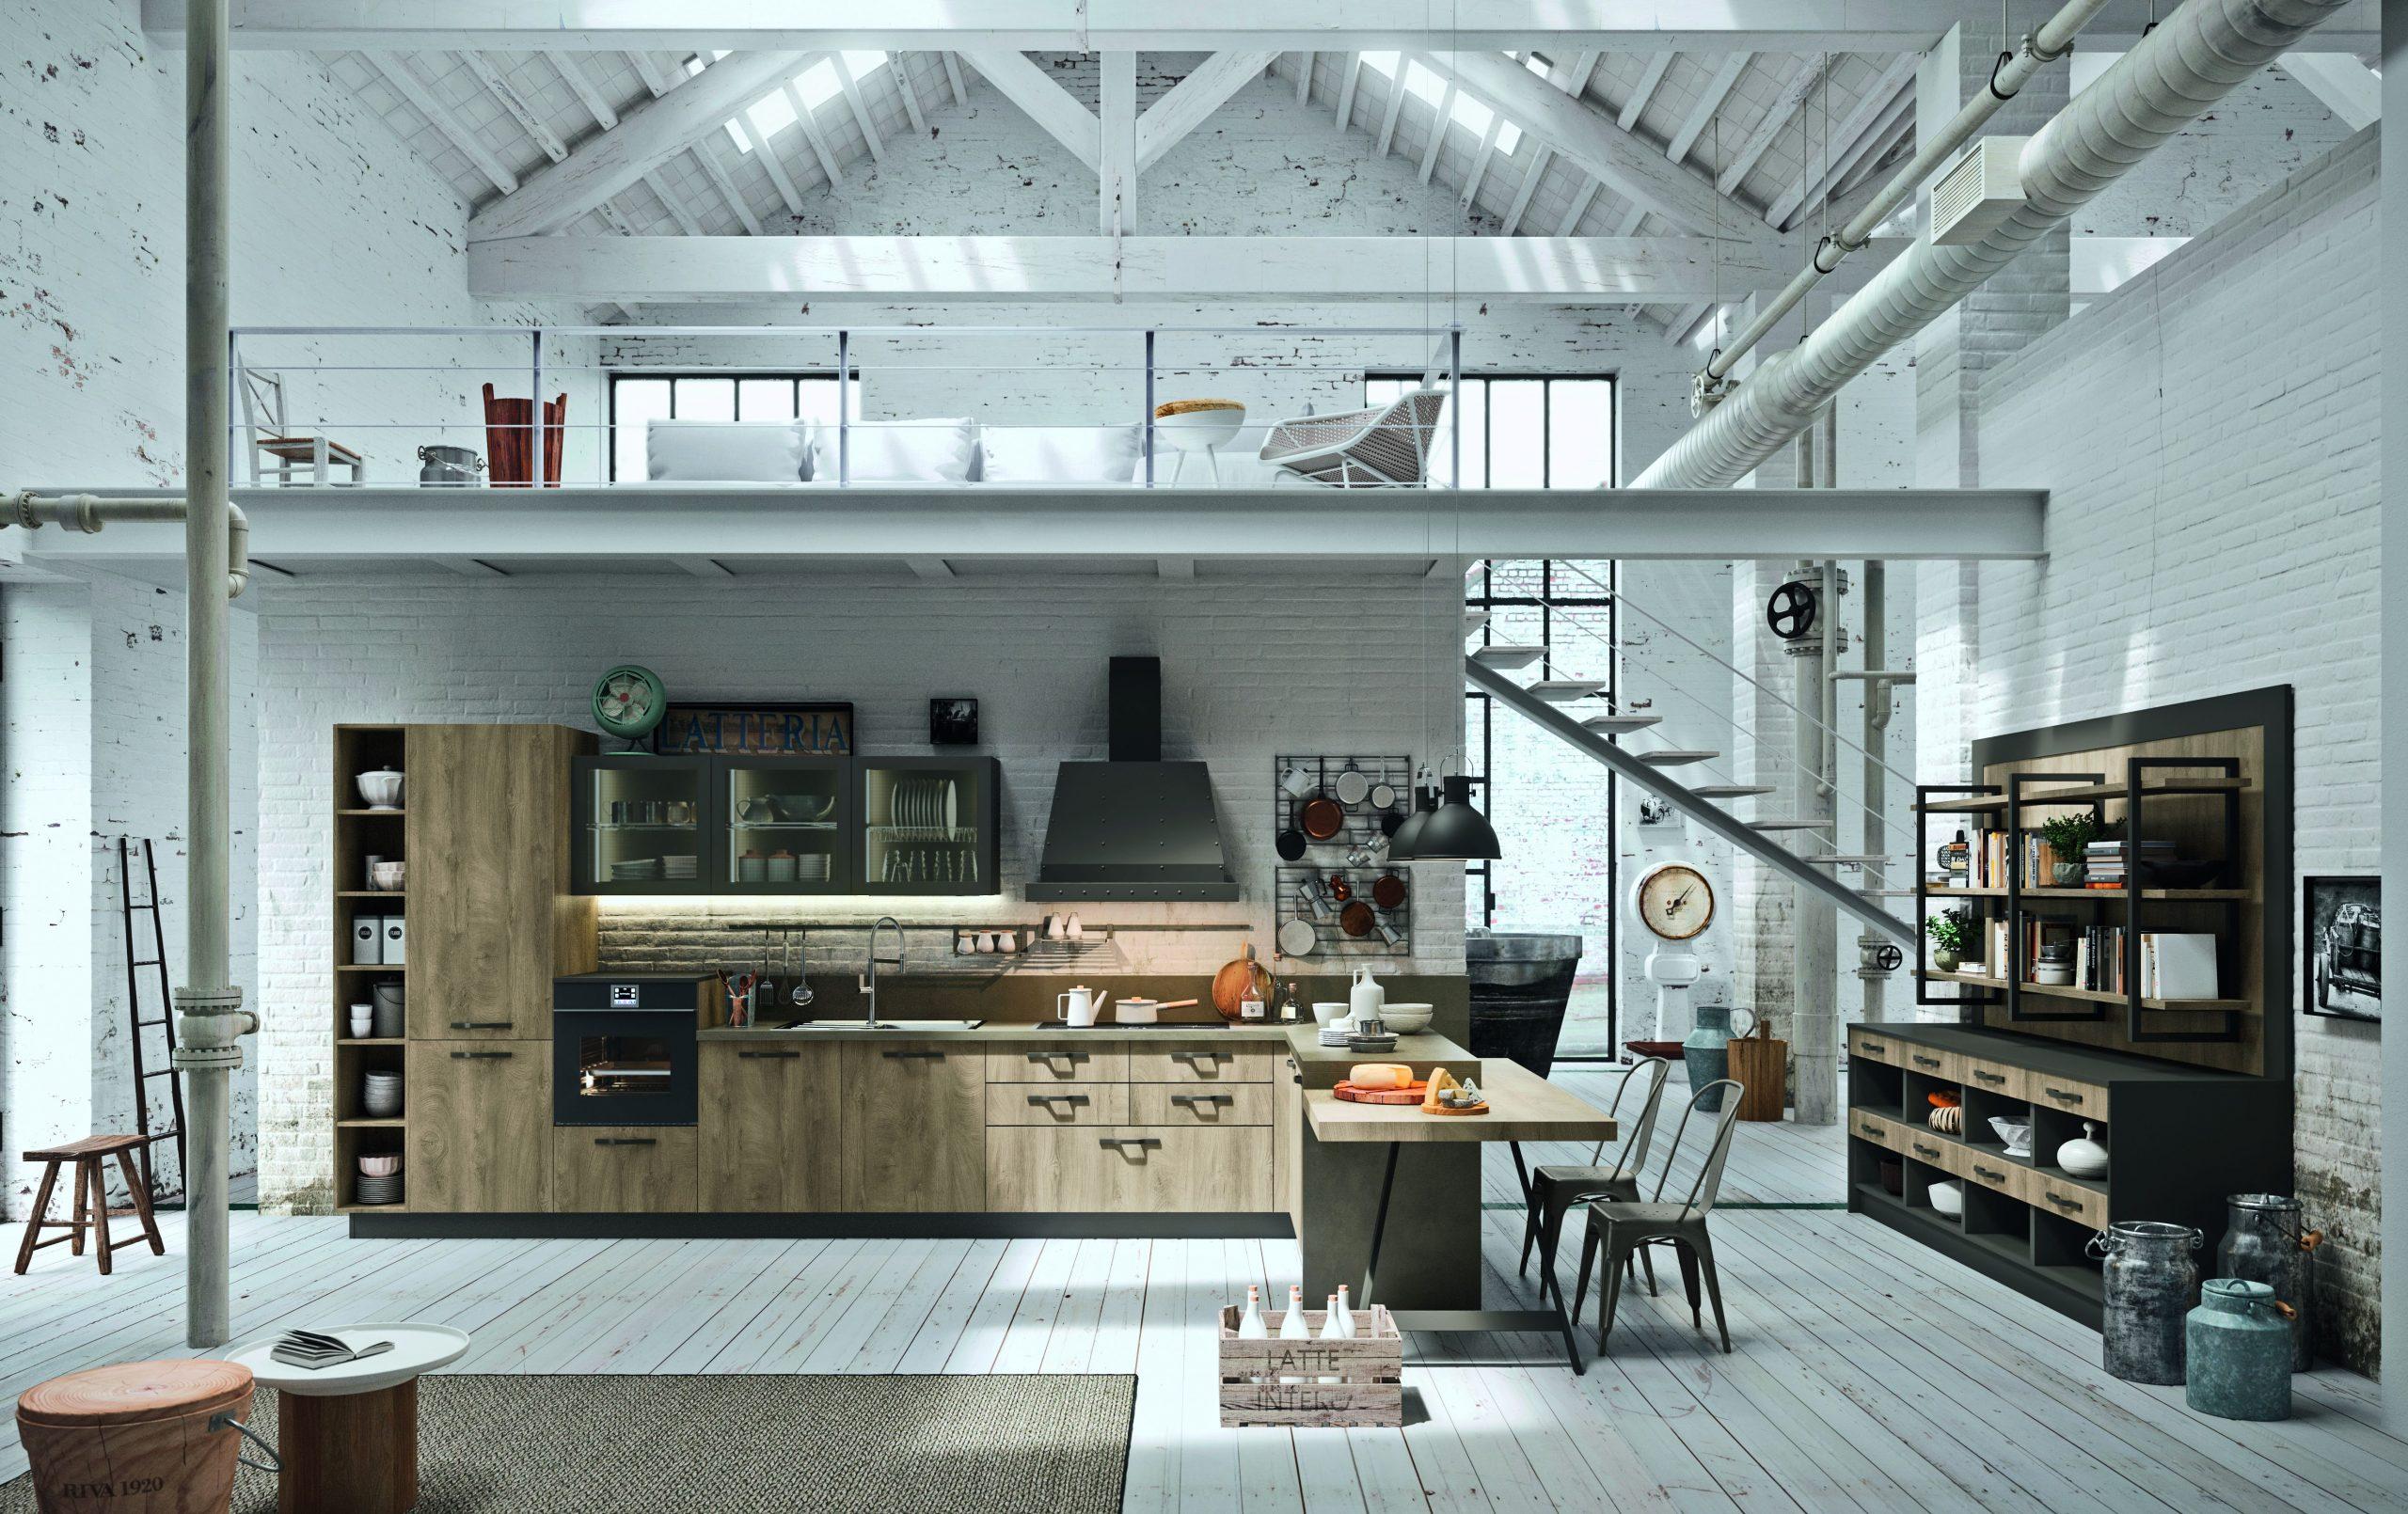 Cucina in stile industriale in un Loft